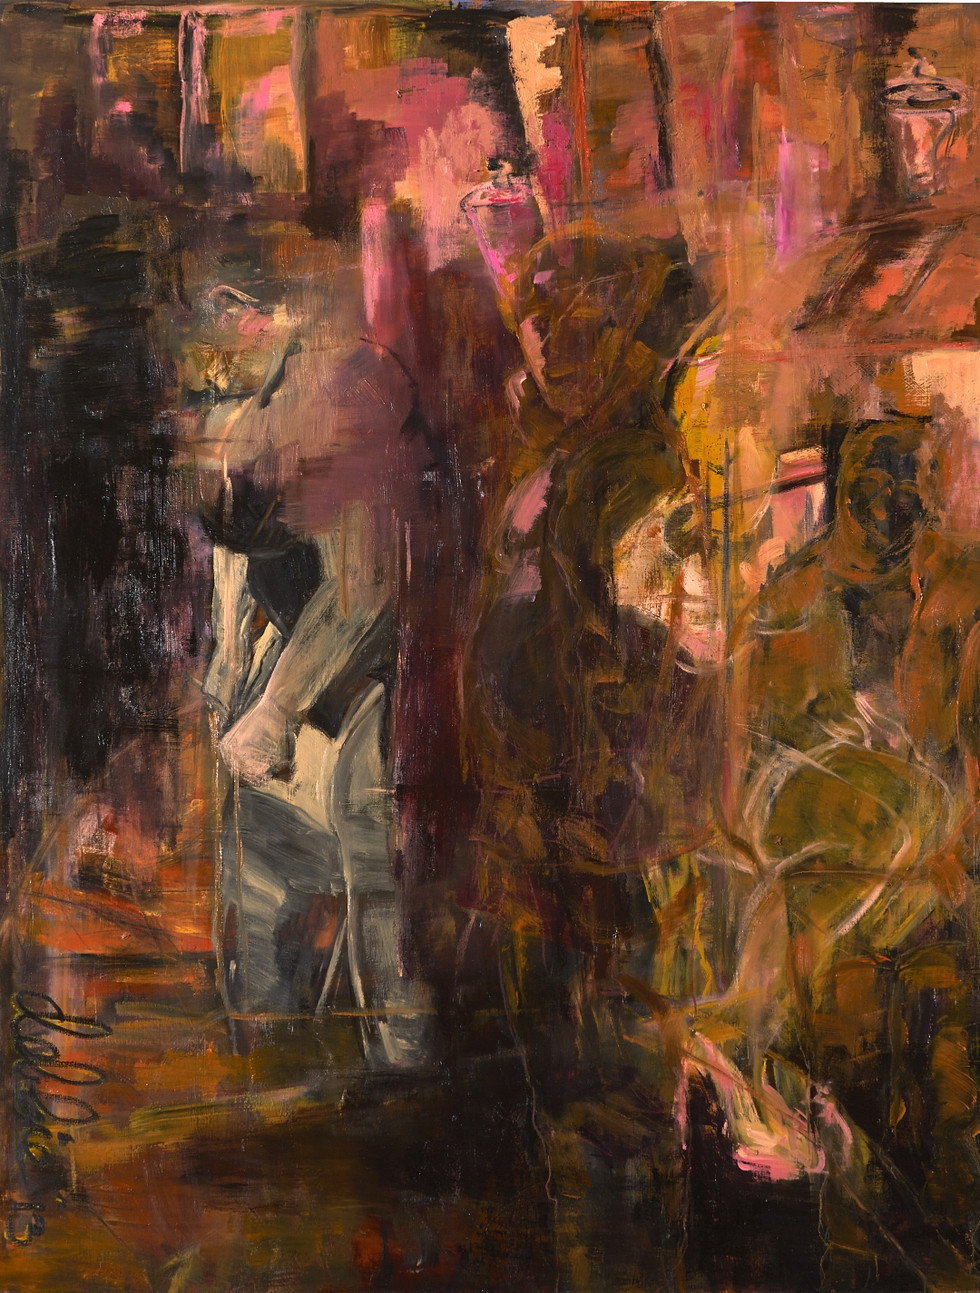 Red Light District Nightlife - 2013 - oil on linen - 200 x 150 cm